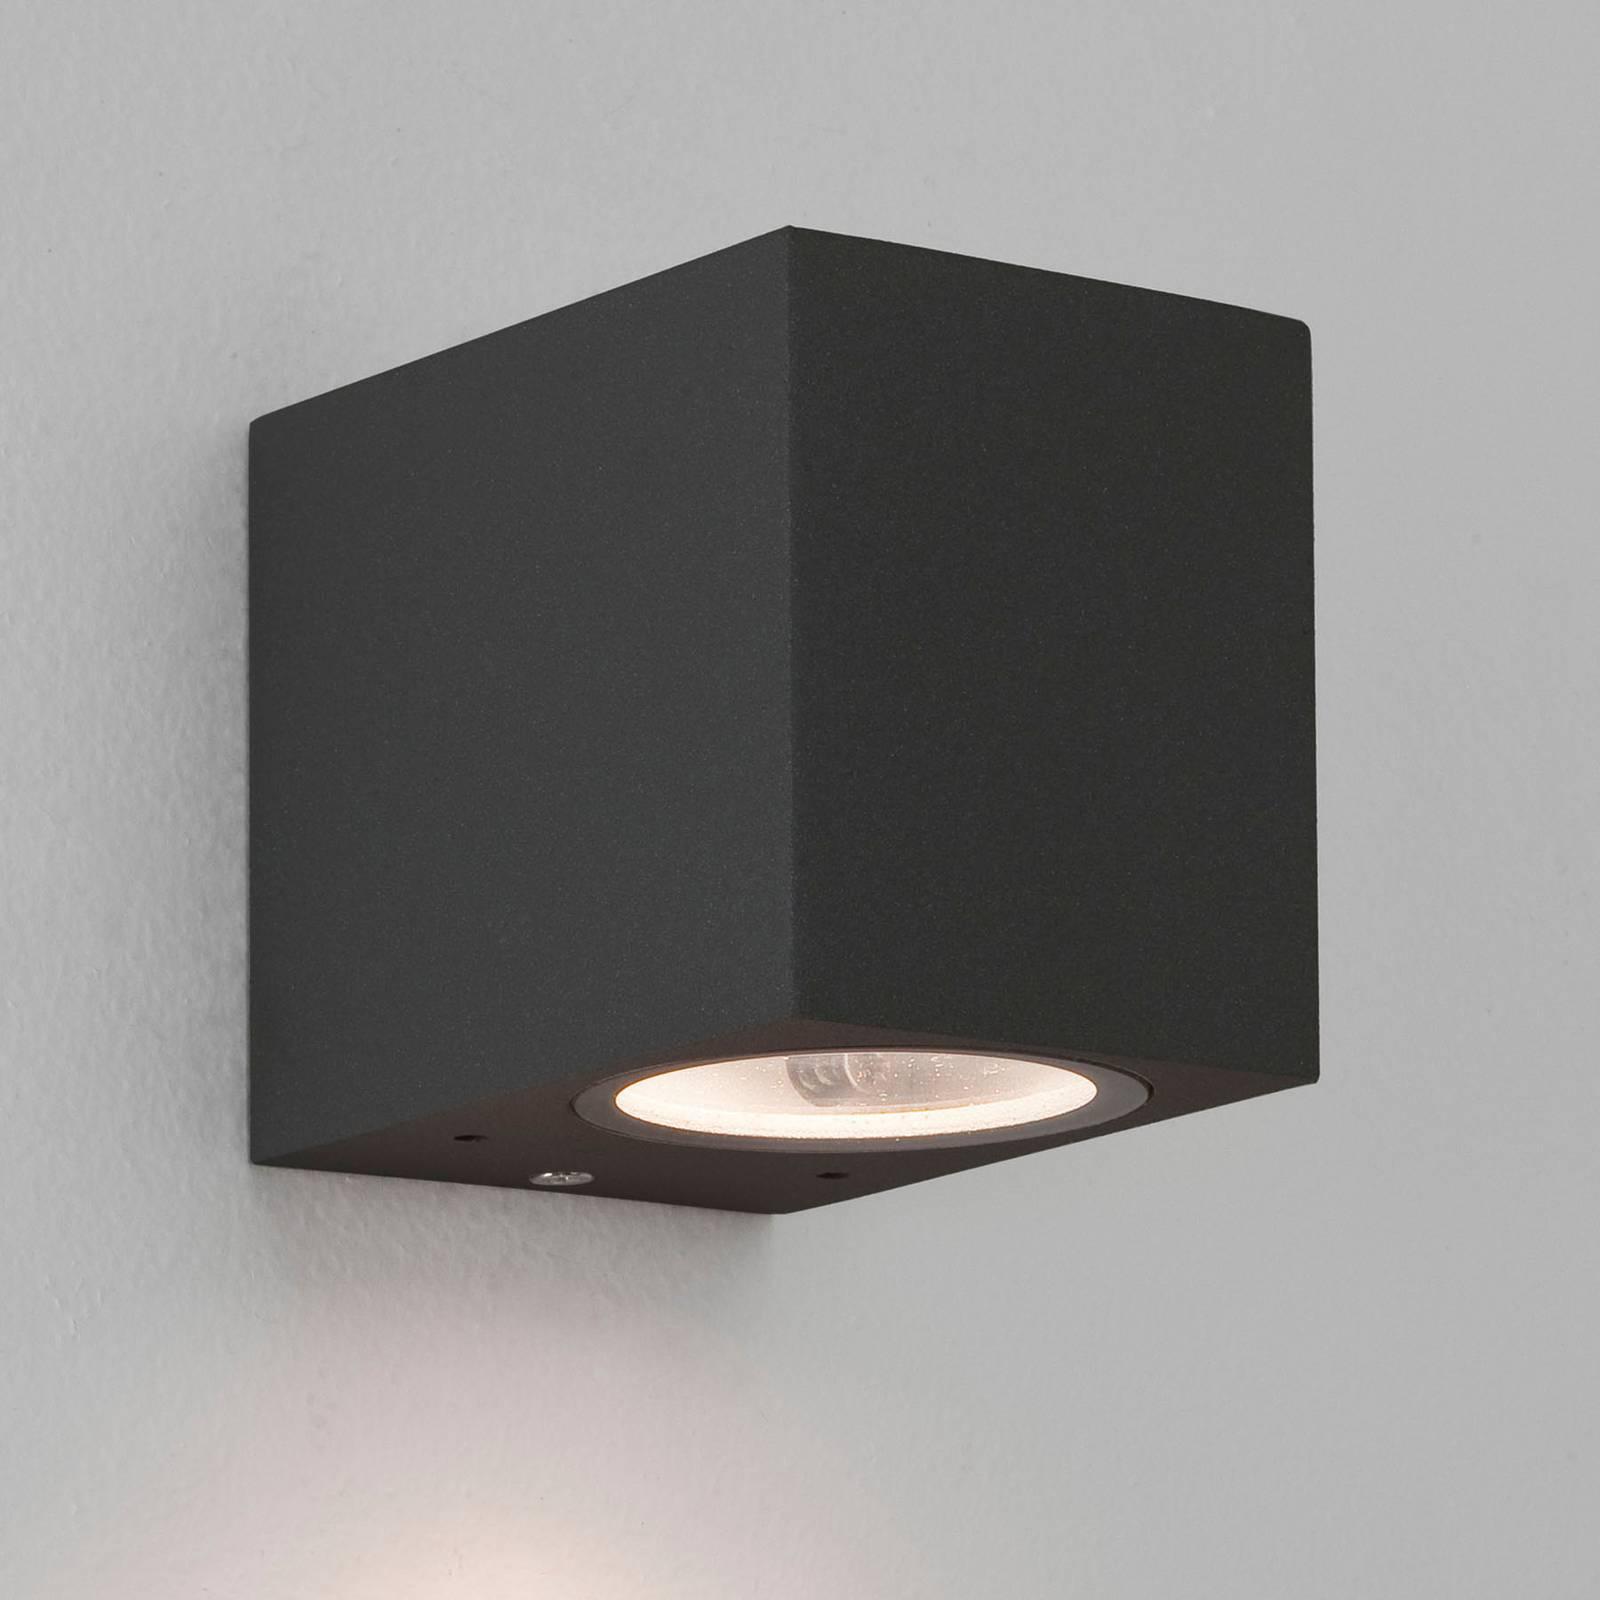 Astro Chios 80 - kompakti ulkoseinälamppu, musta